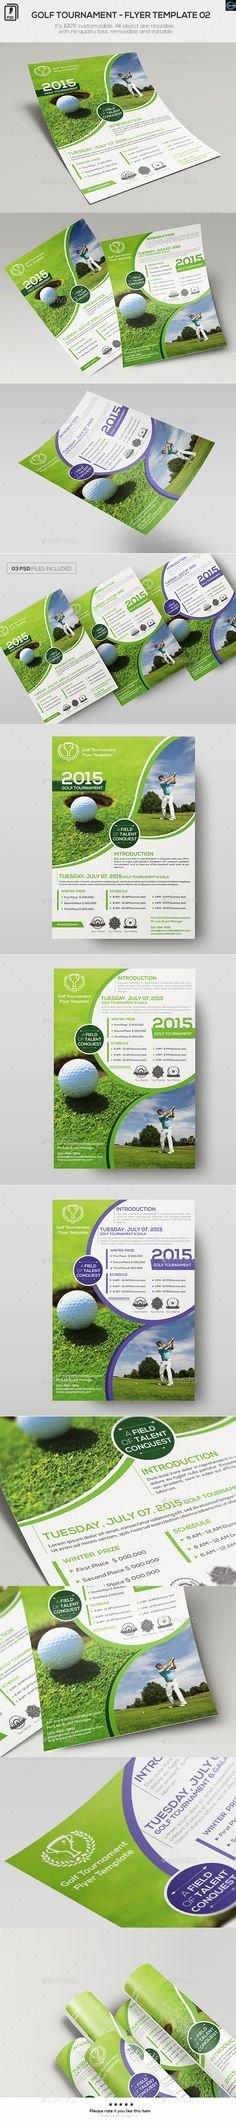 Free Golf tournament Flyer Template Elegant Golf tournament Flyer Template No Model Required